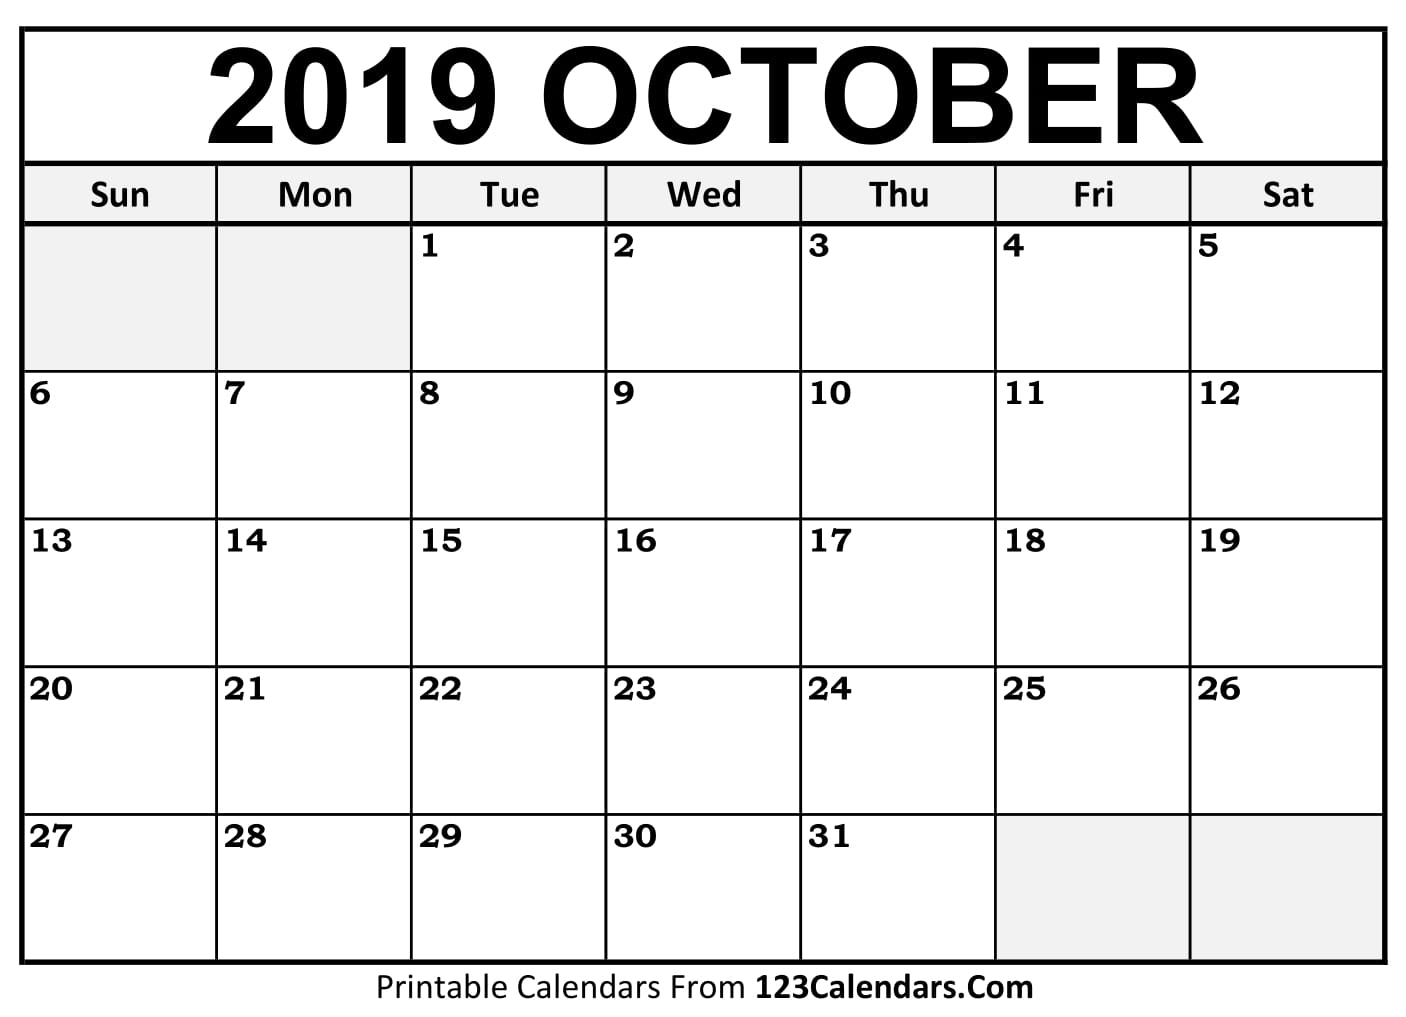 Blank Calendar October : Printable october calendar templates calendars